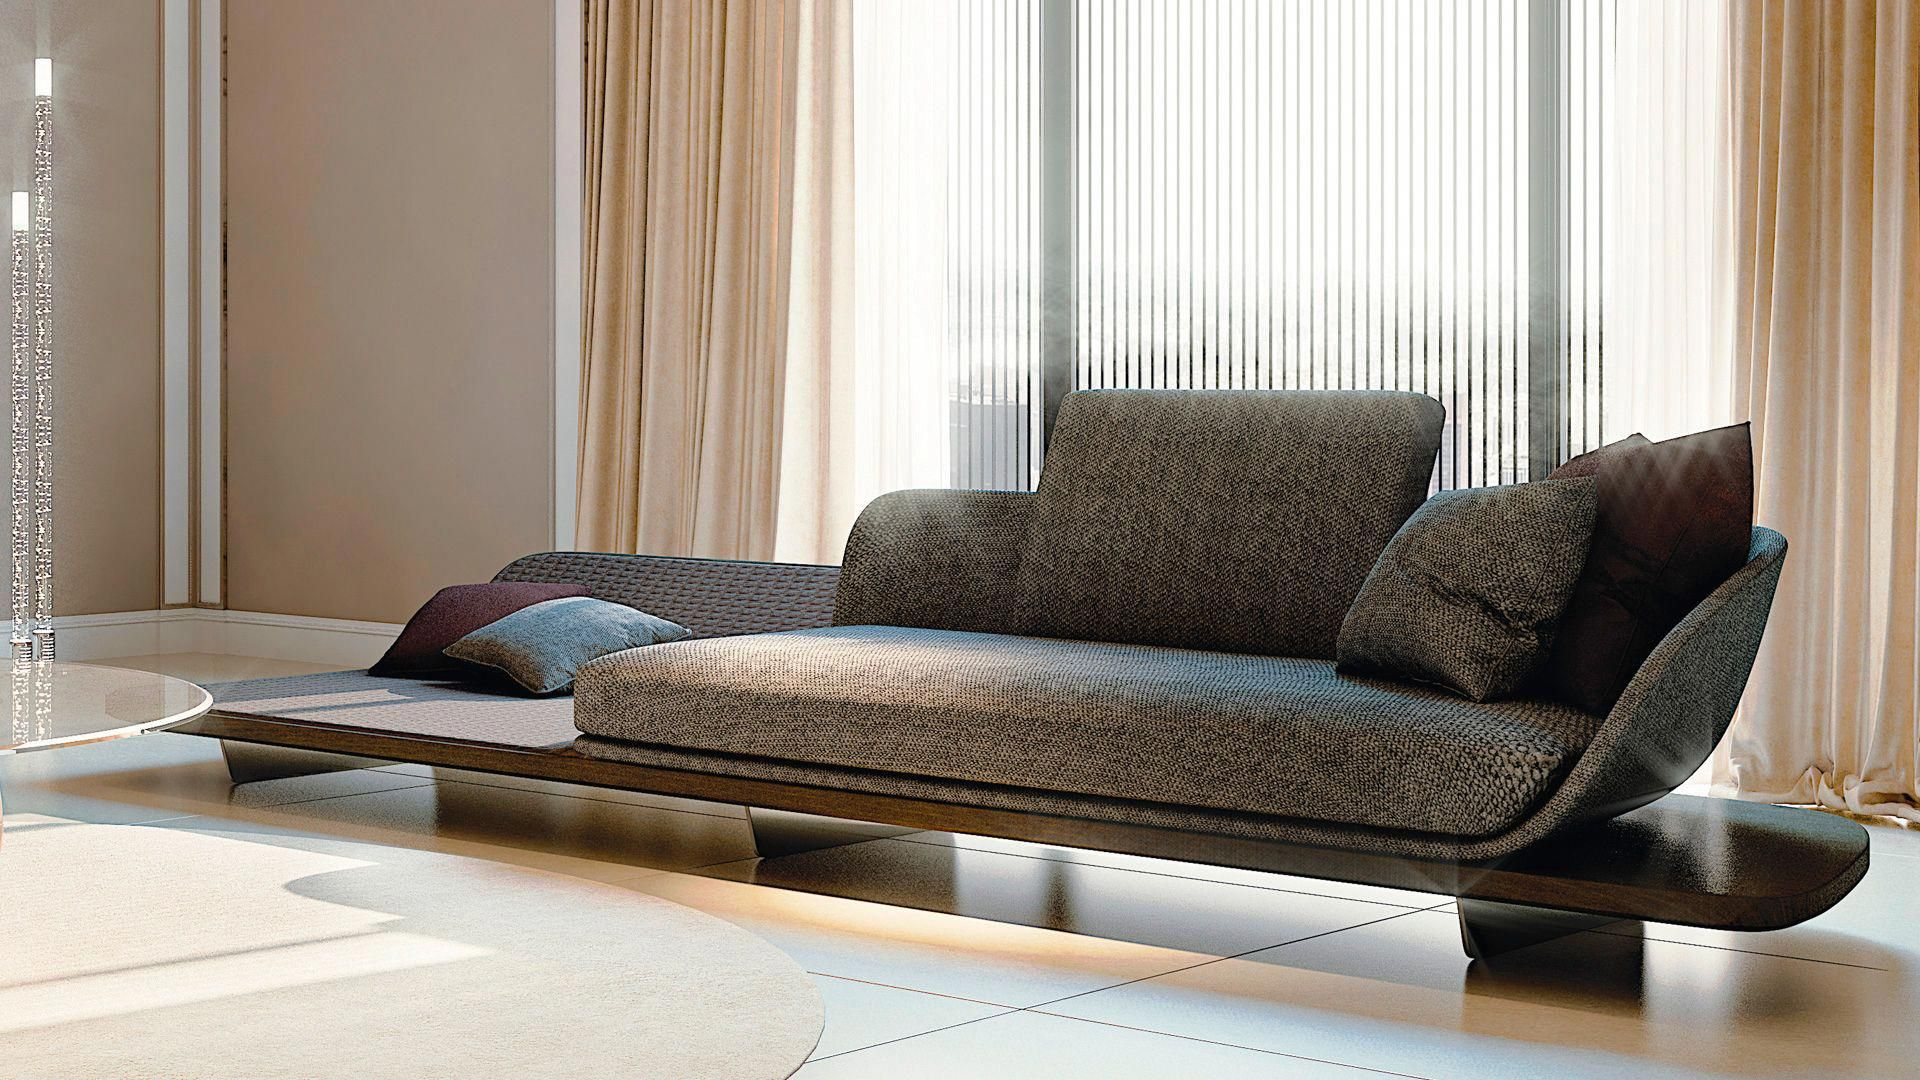 HighEnd Italian Segno Chaise Lounge Italian Designer